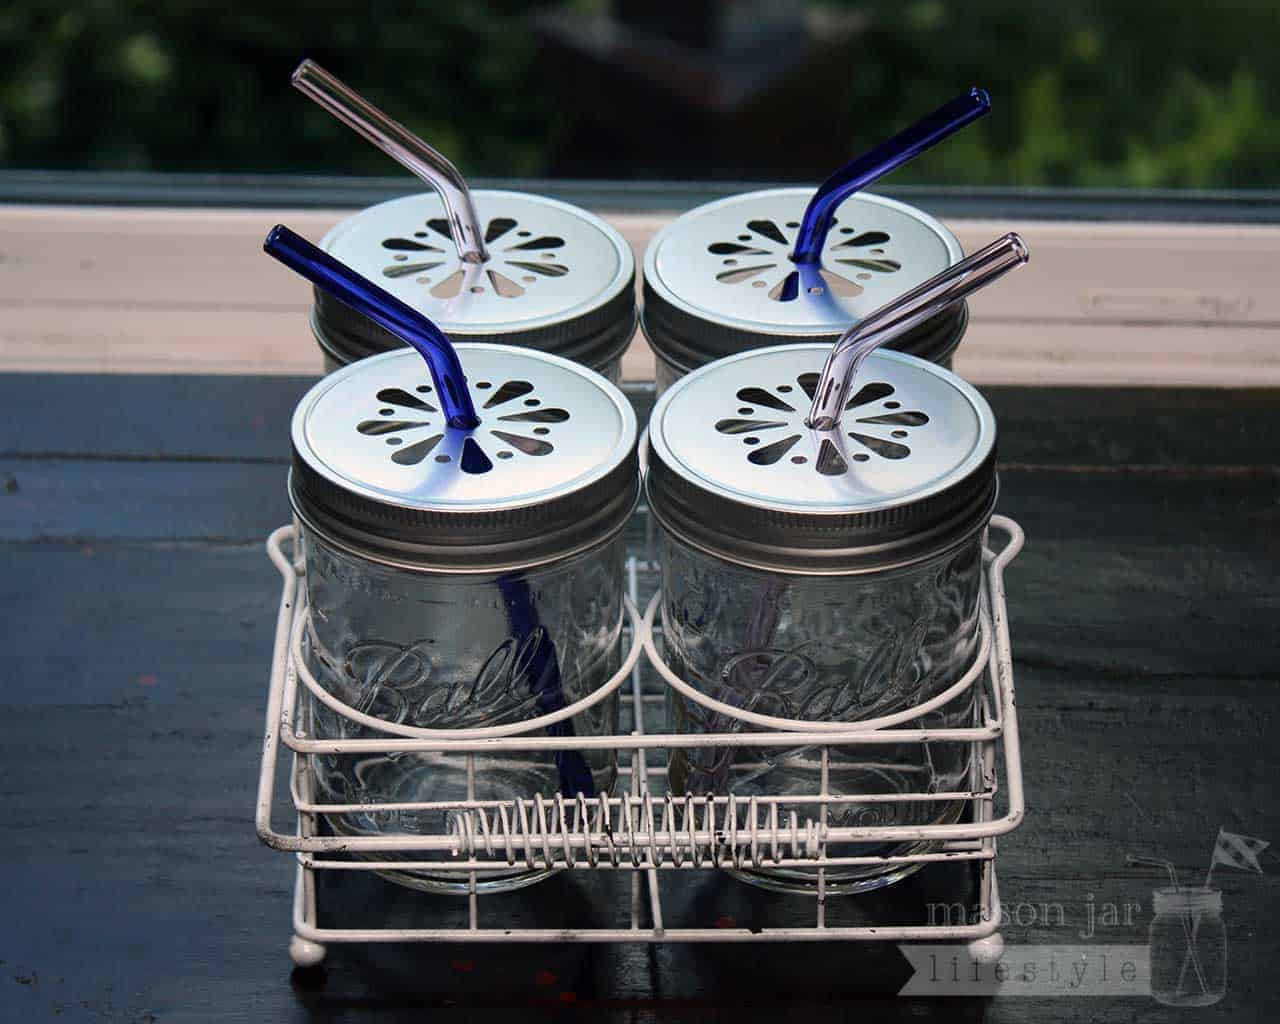 Shiny Silver Daisy Straw Hole Lids For Wide Mouth Mason Jars